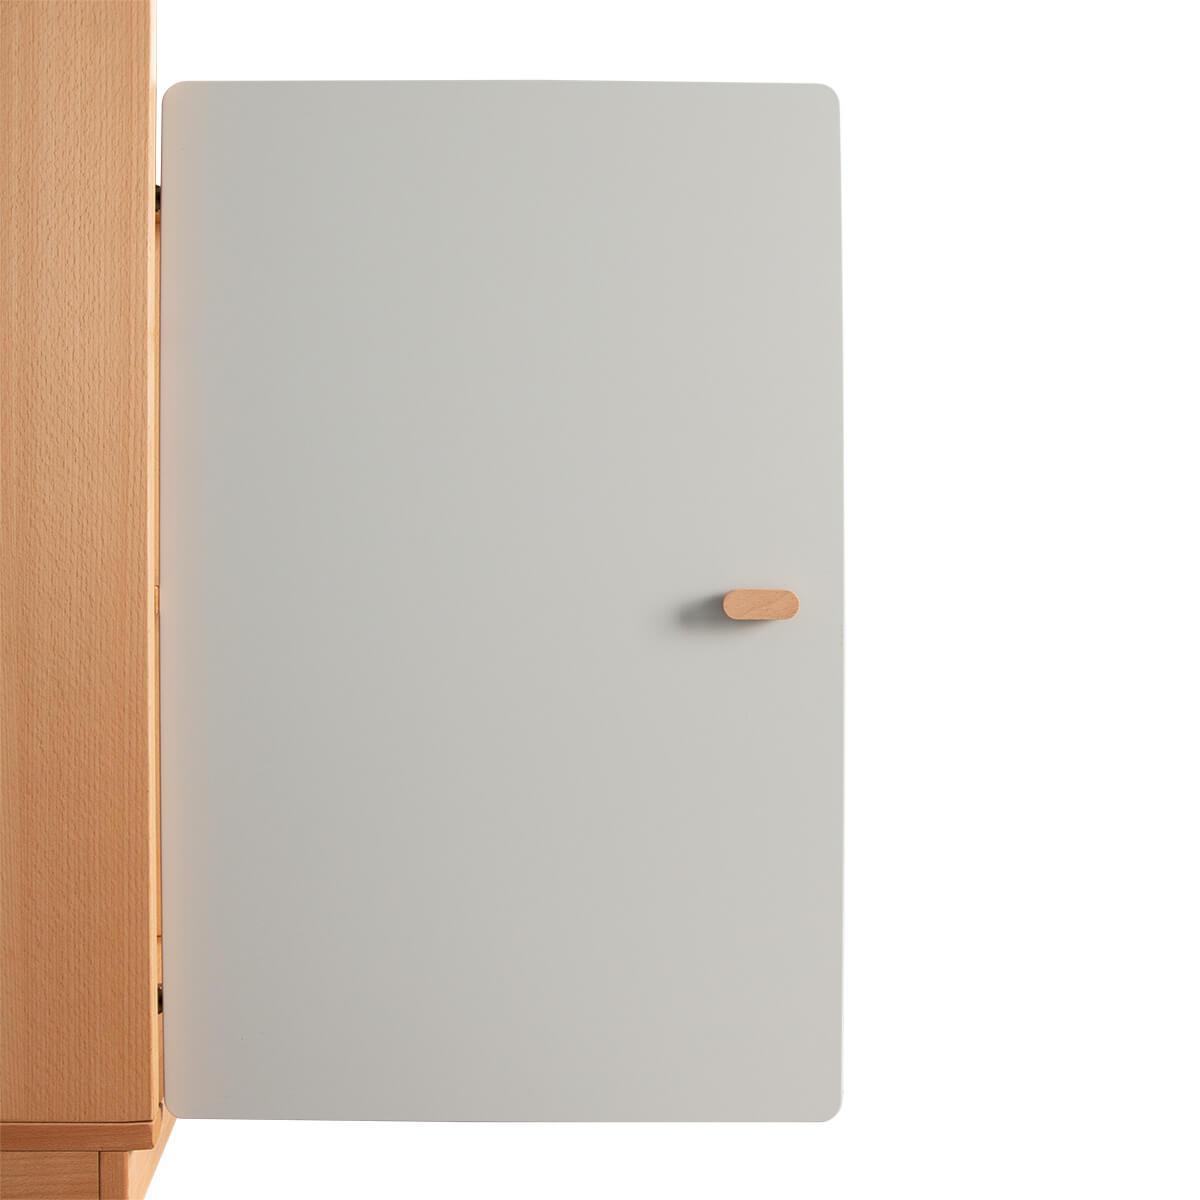 Schranktür 2/5 70cm-Griff DESTYLE de Breuyn MDF grau-lackiert